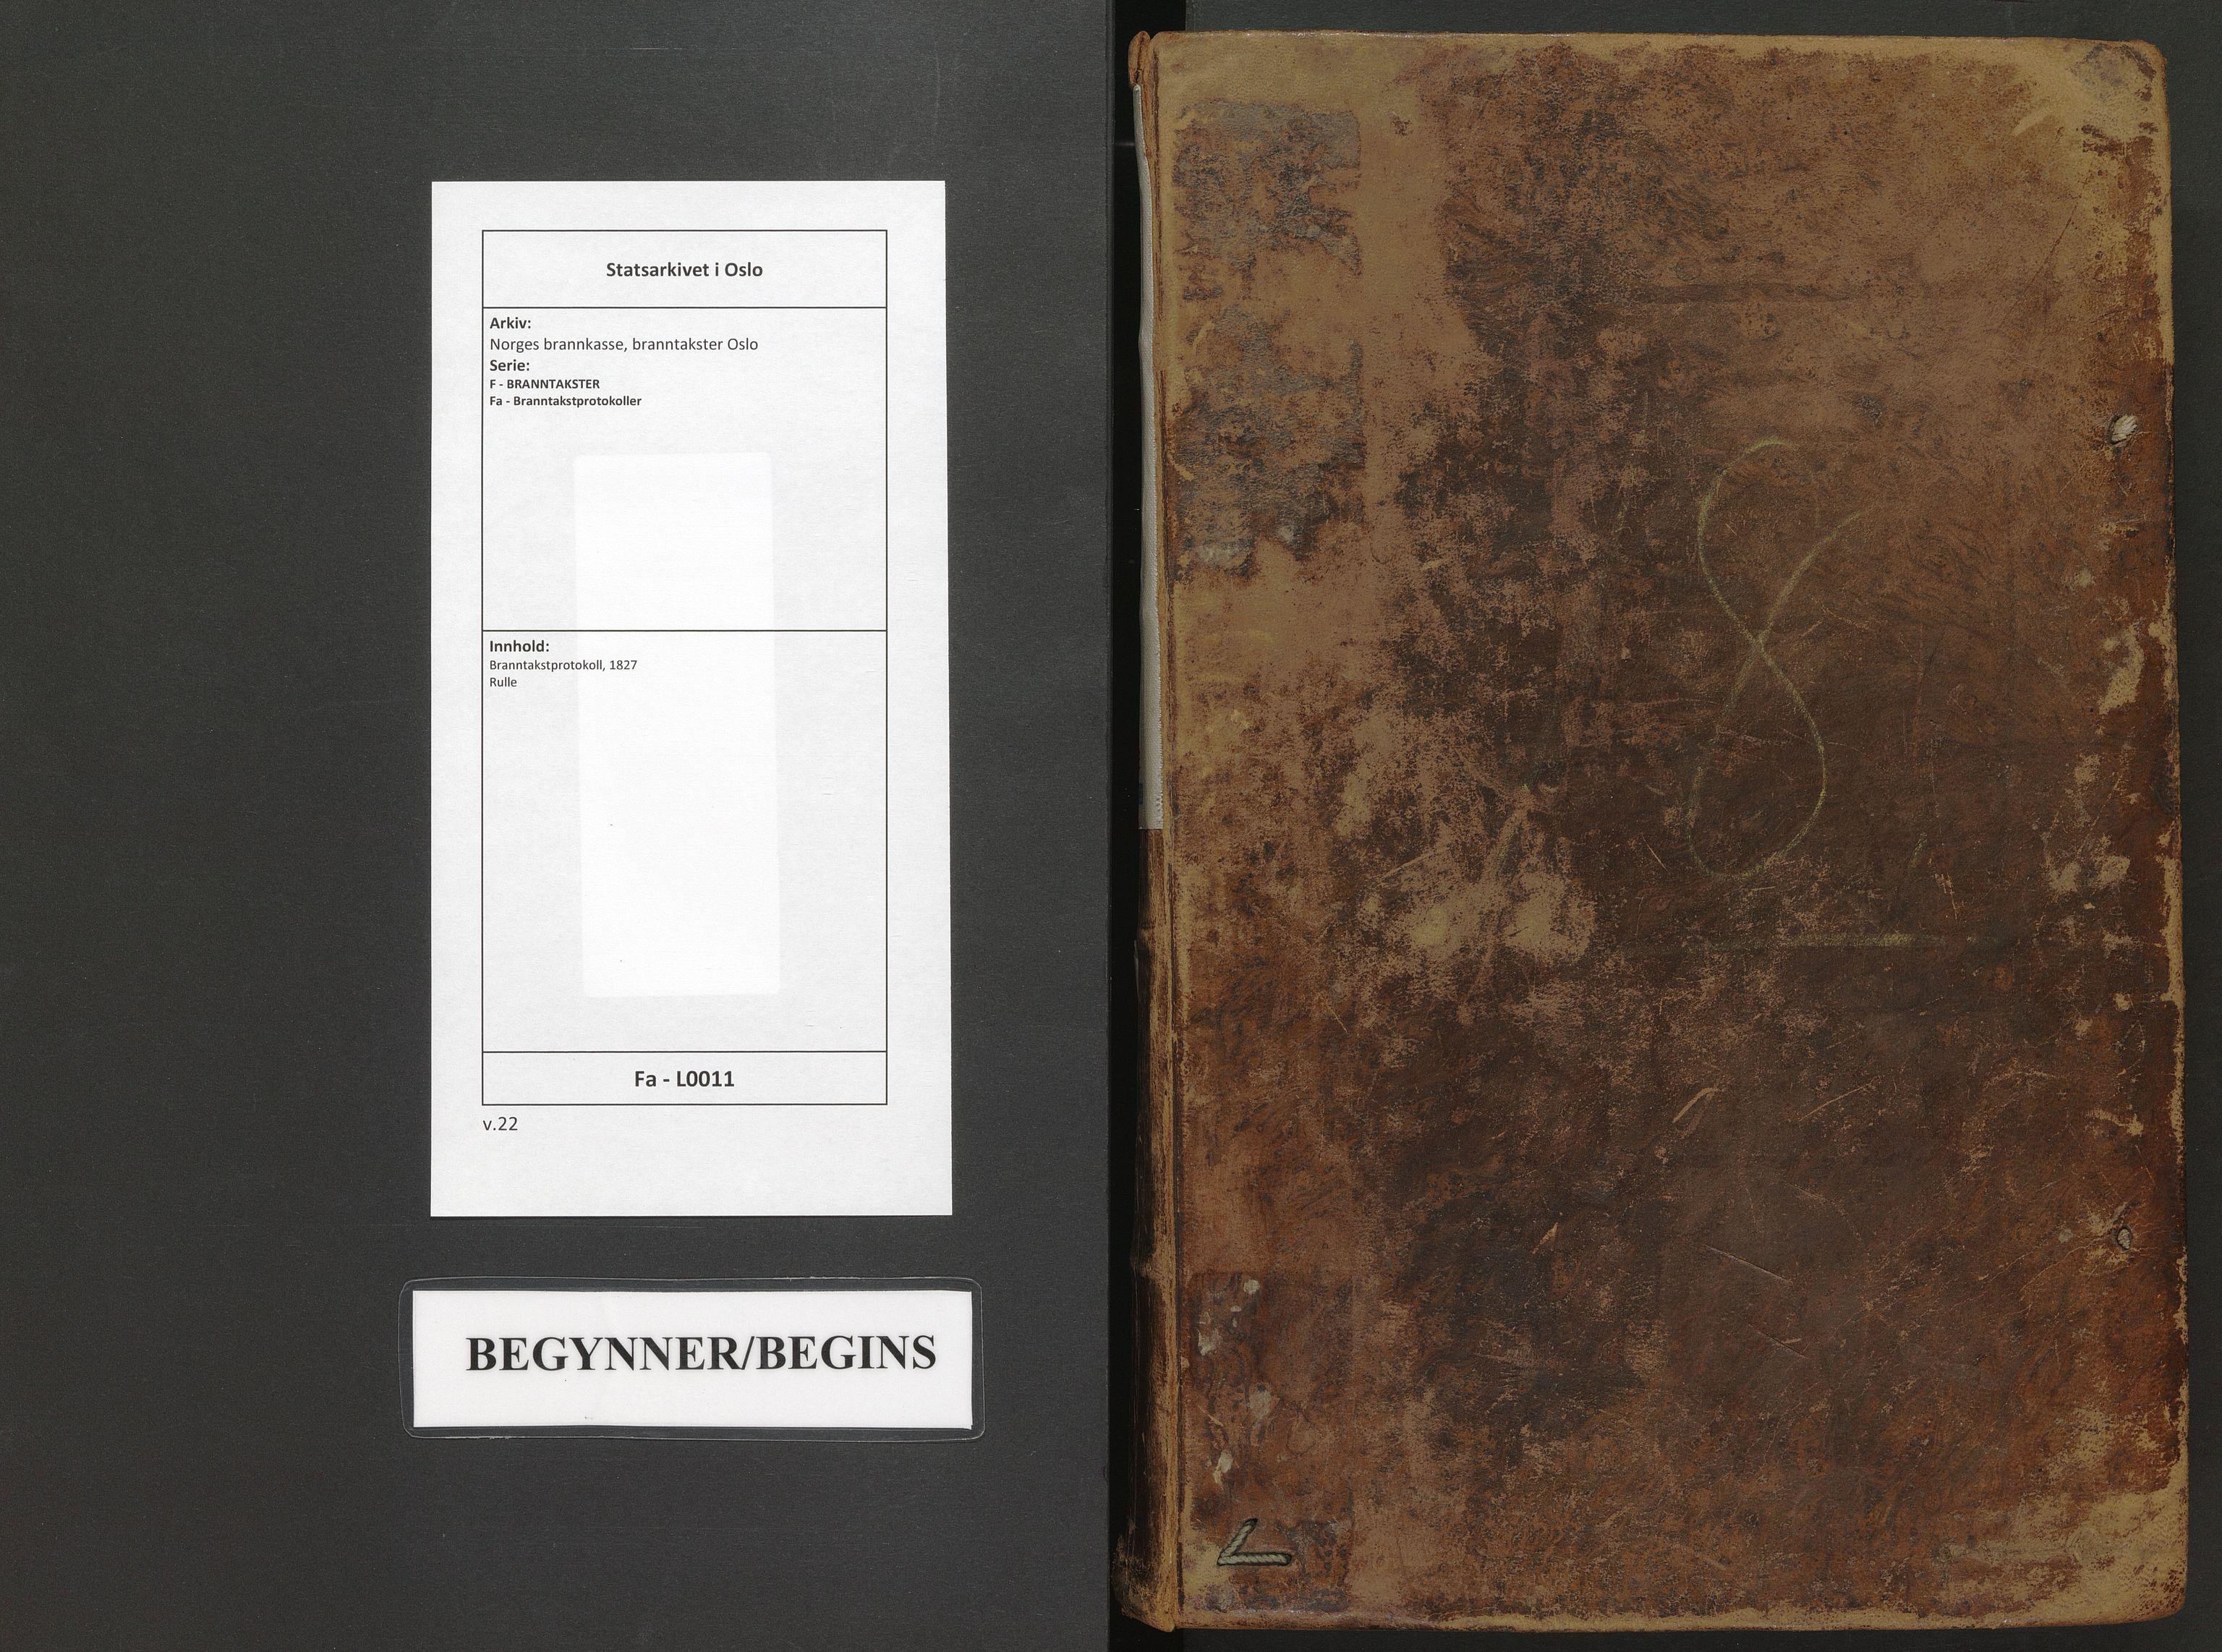 SAO, Norges brannkasse, branntakster Oslo, F/Fa/L0011: Branntakstprotokoll, 1827